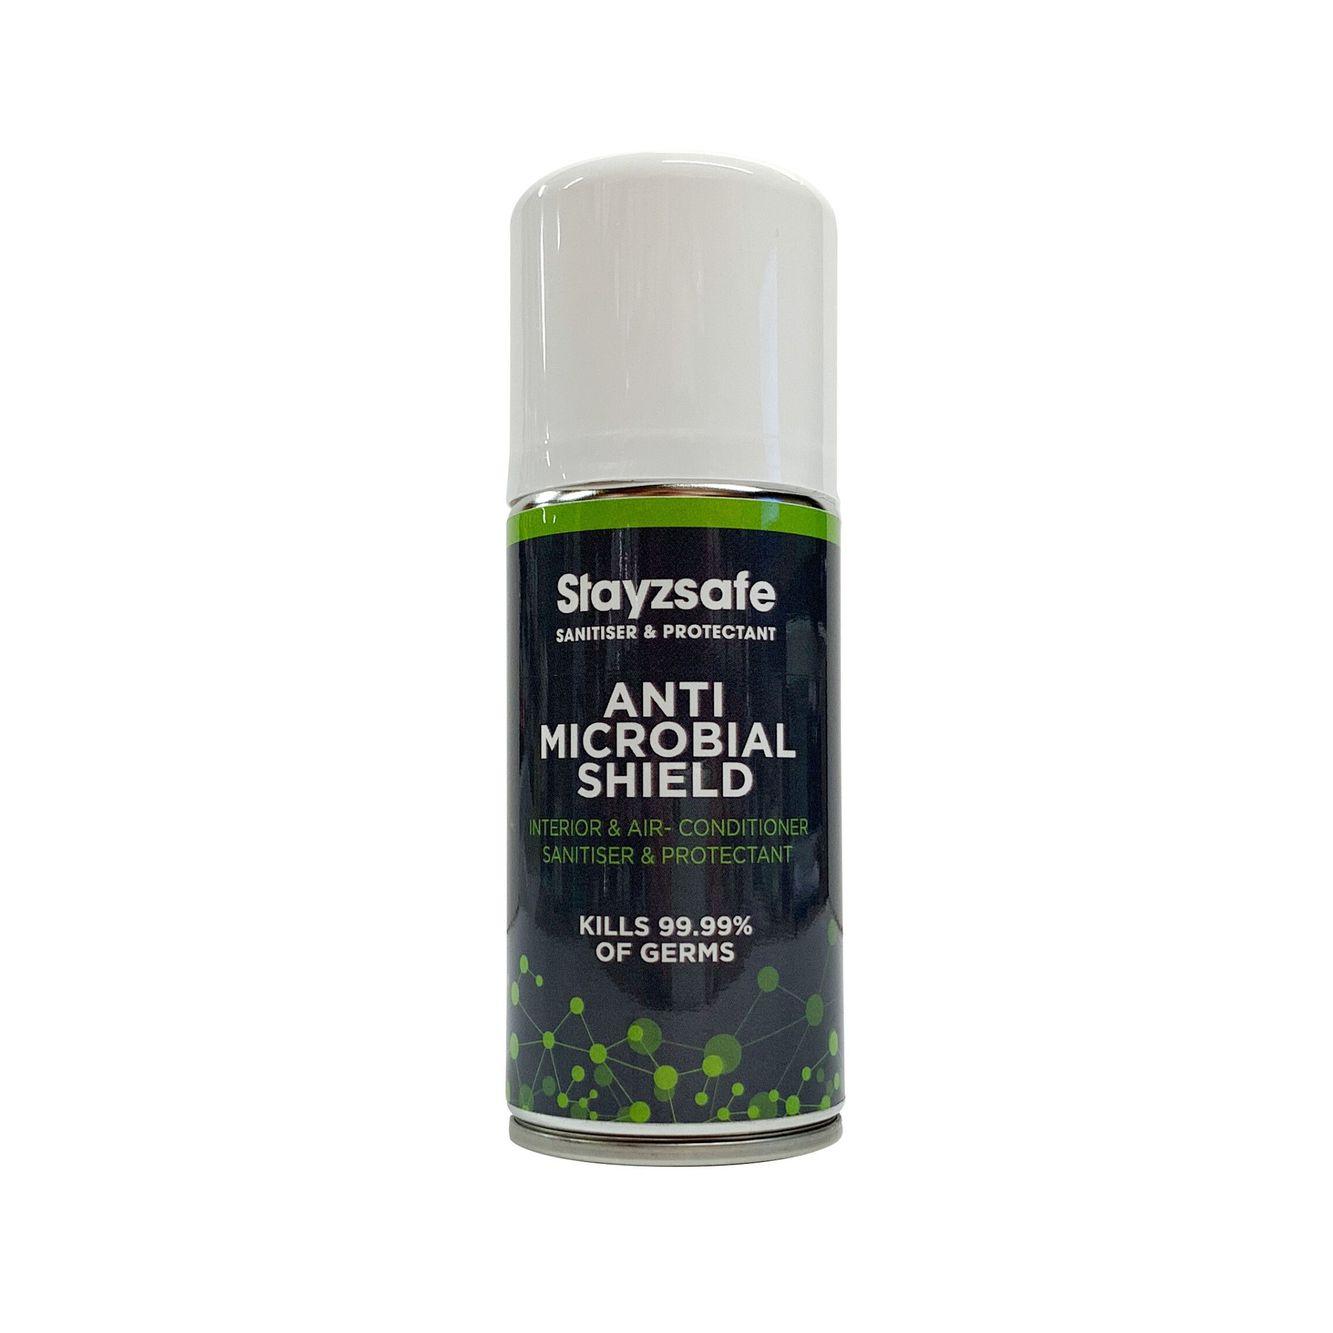 stayzsafe anti microbial shied